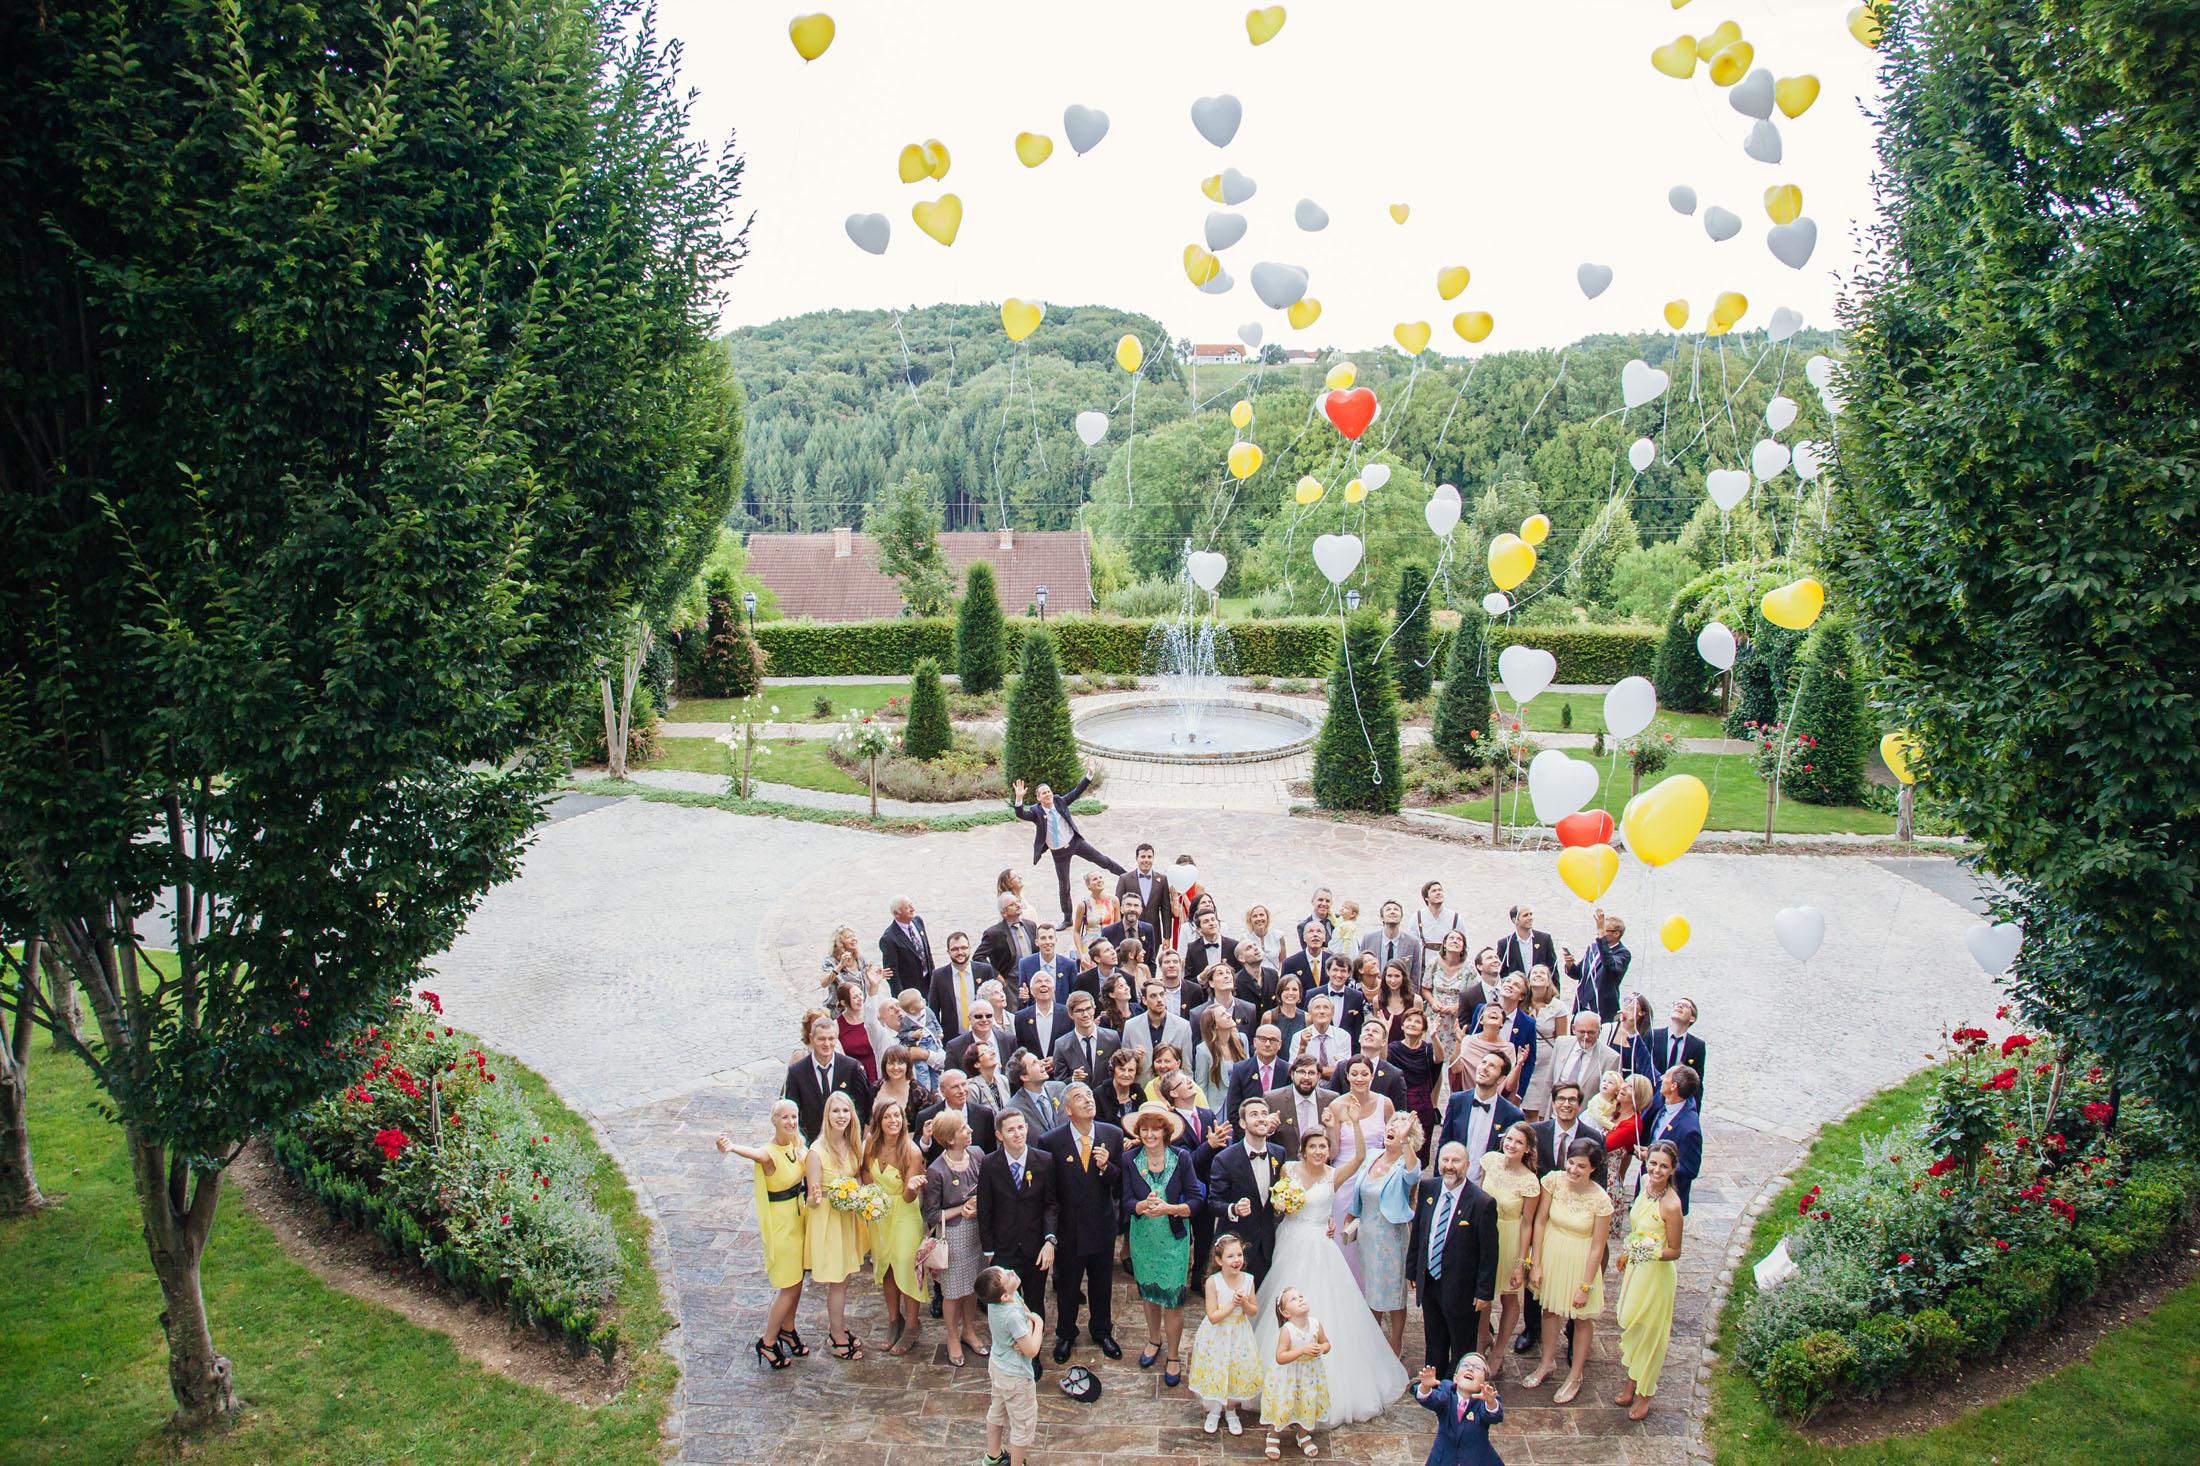 Hochzeit Karina & Johannes Gruppenfoto Hochzeitgesellschaft mit Ballons im Weinschloss Thaller